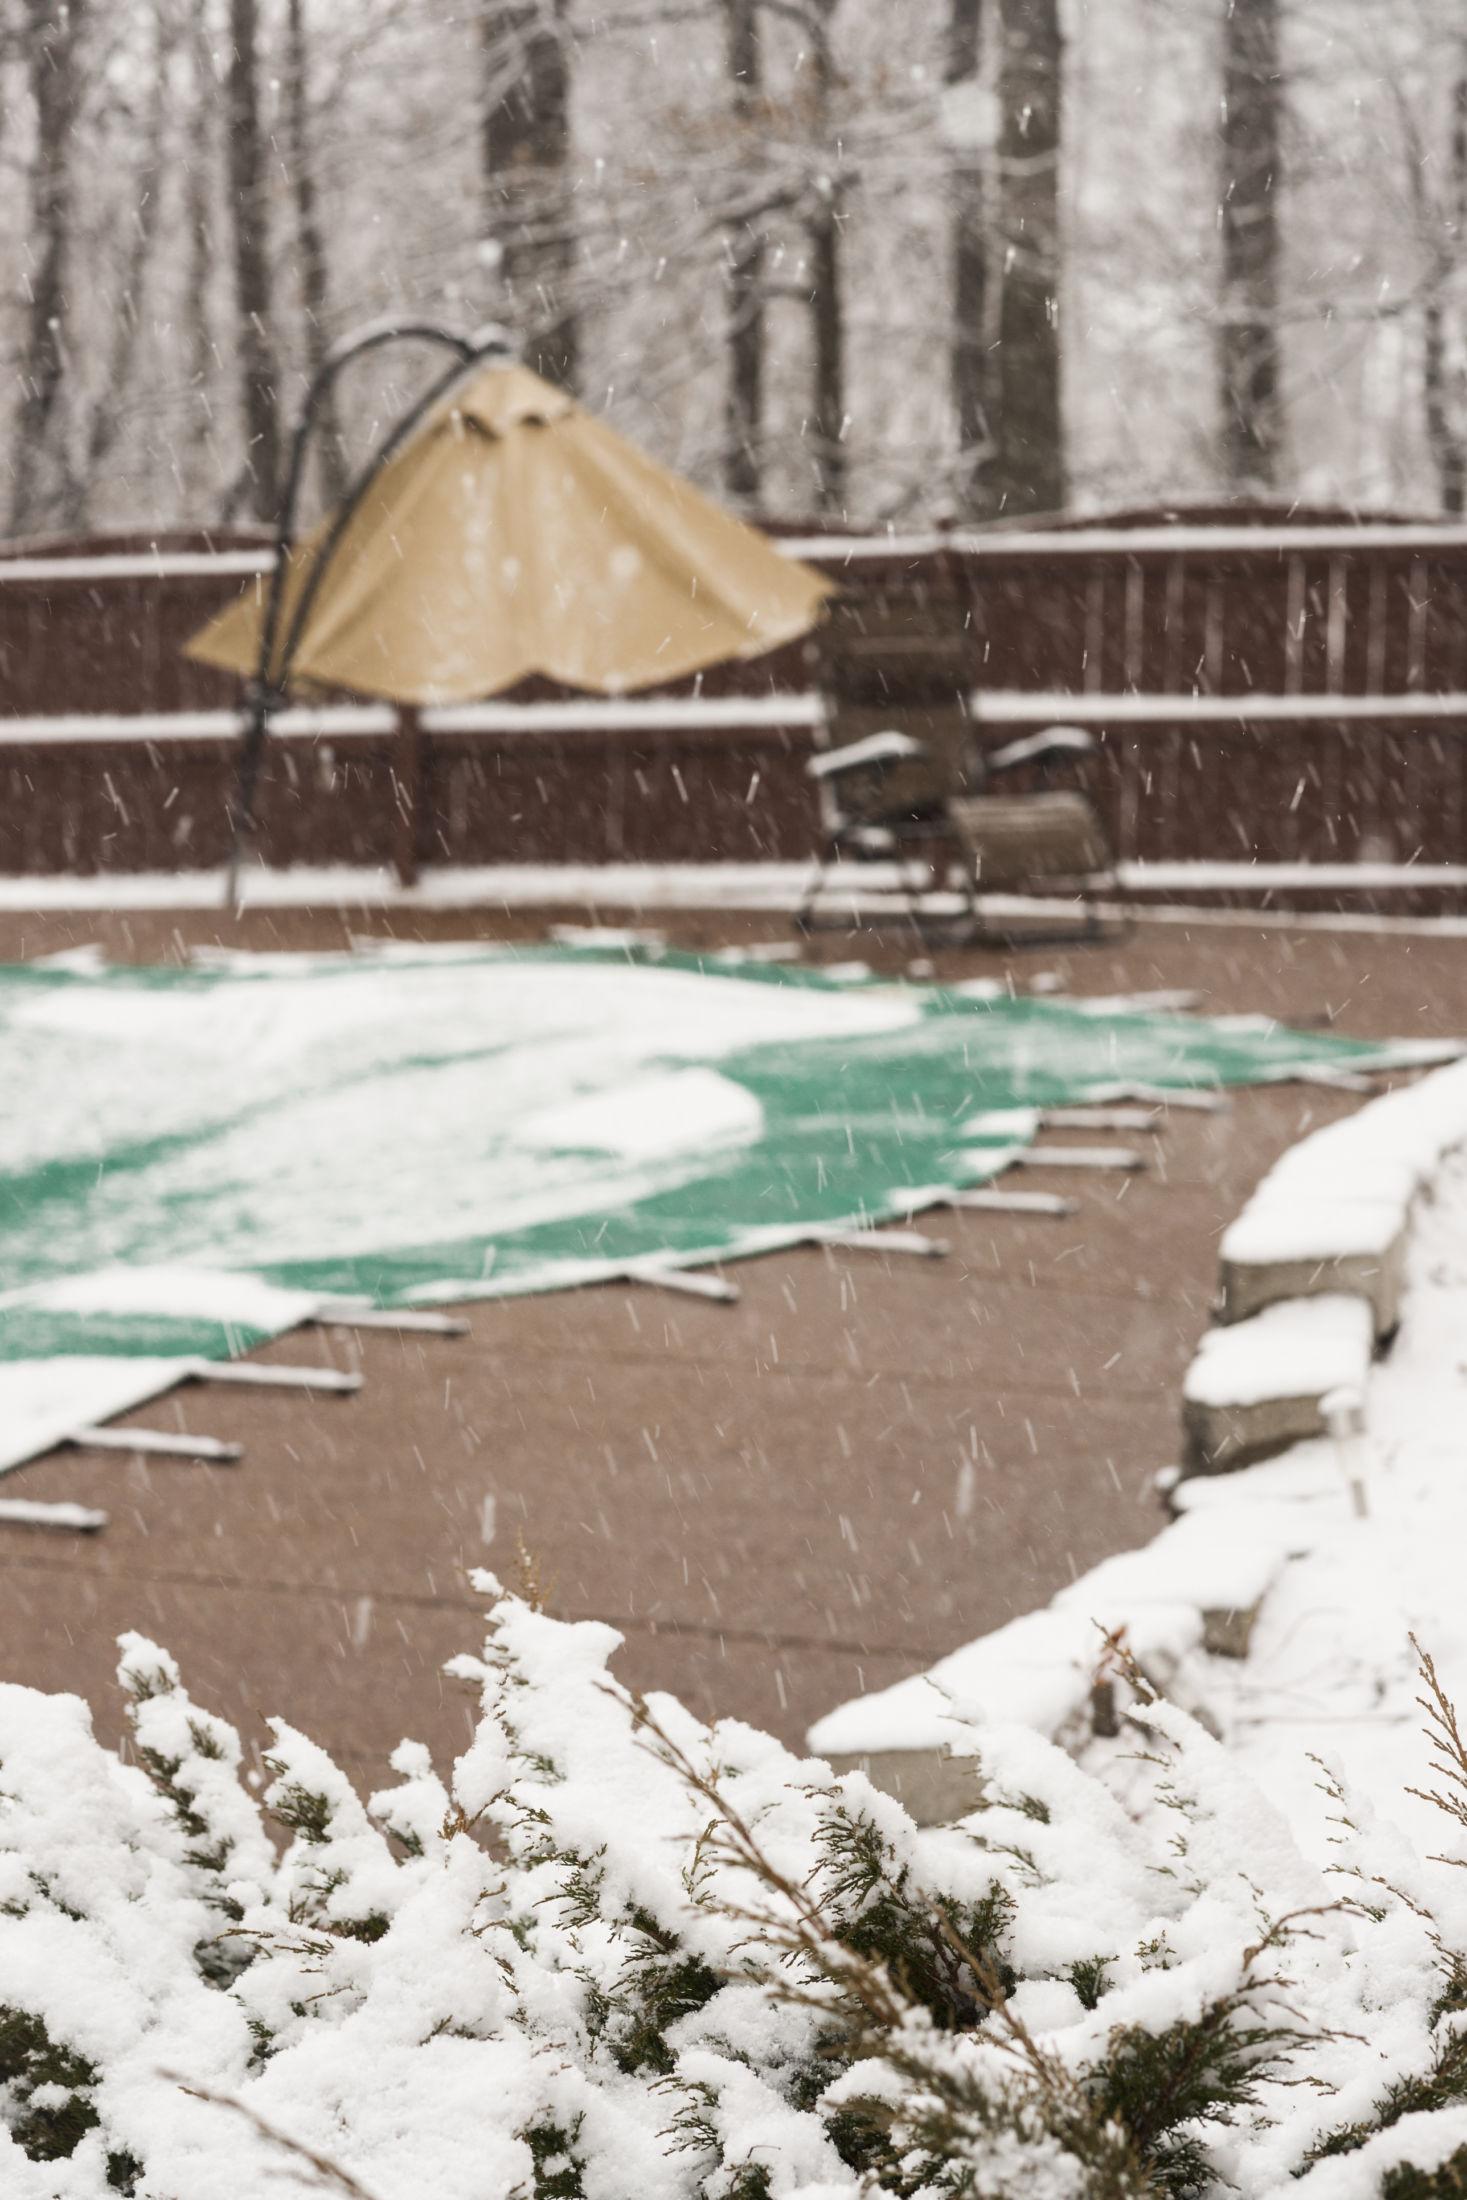 Winter-pool-cover-snow-on-inground-pool